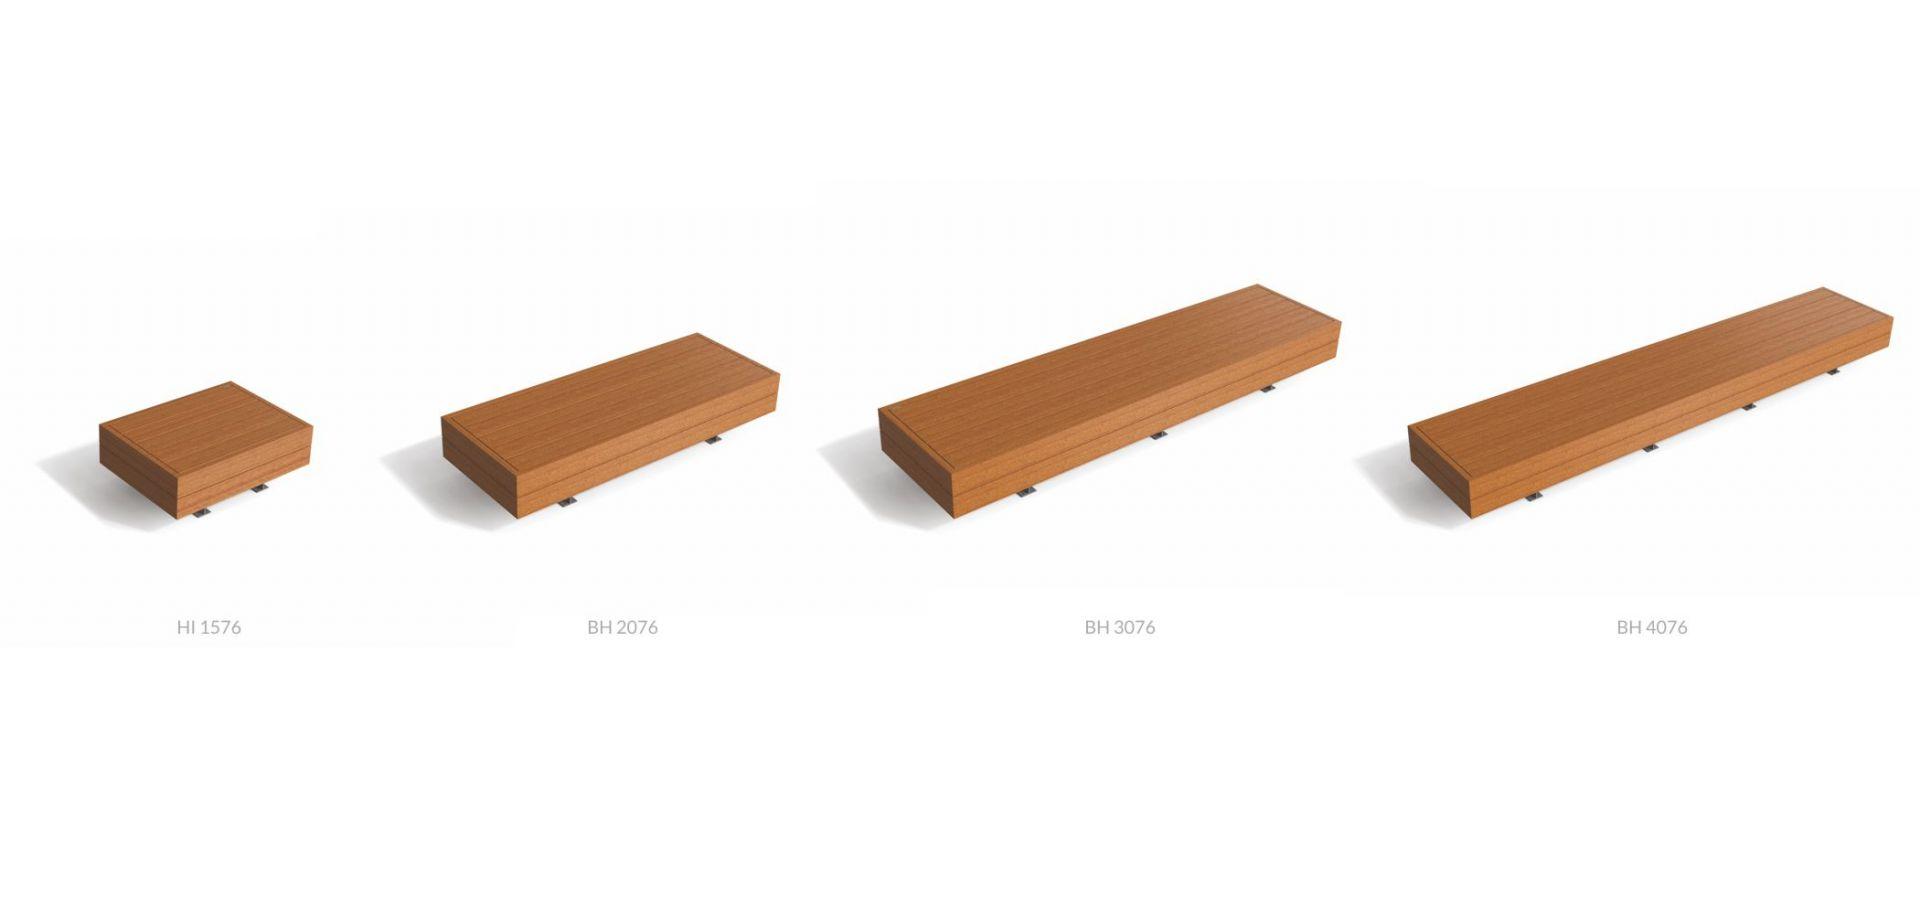 BIG HARRIS Banc Urbain Design Bois, Mélèze, WPC - METALCO Fabricant Mobilier Urbain Design